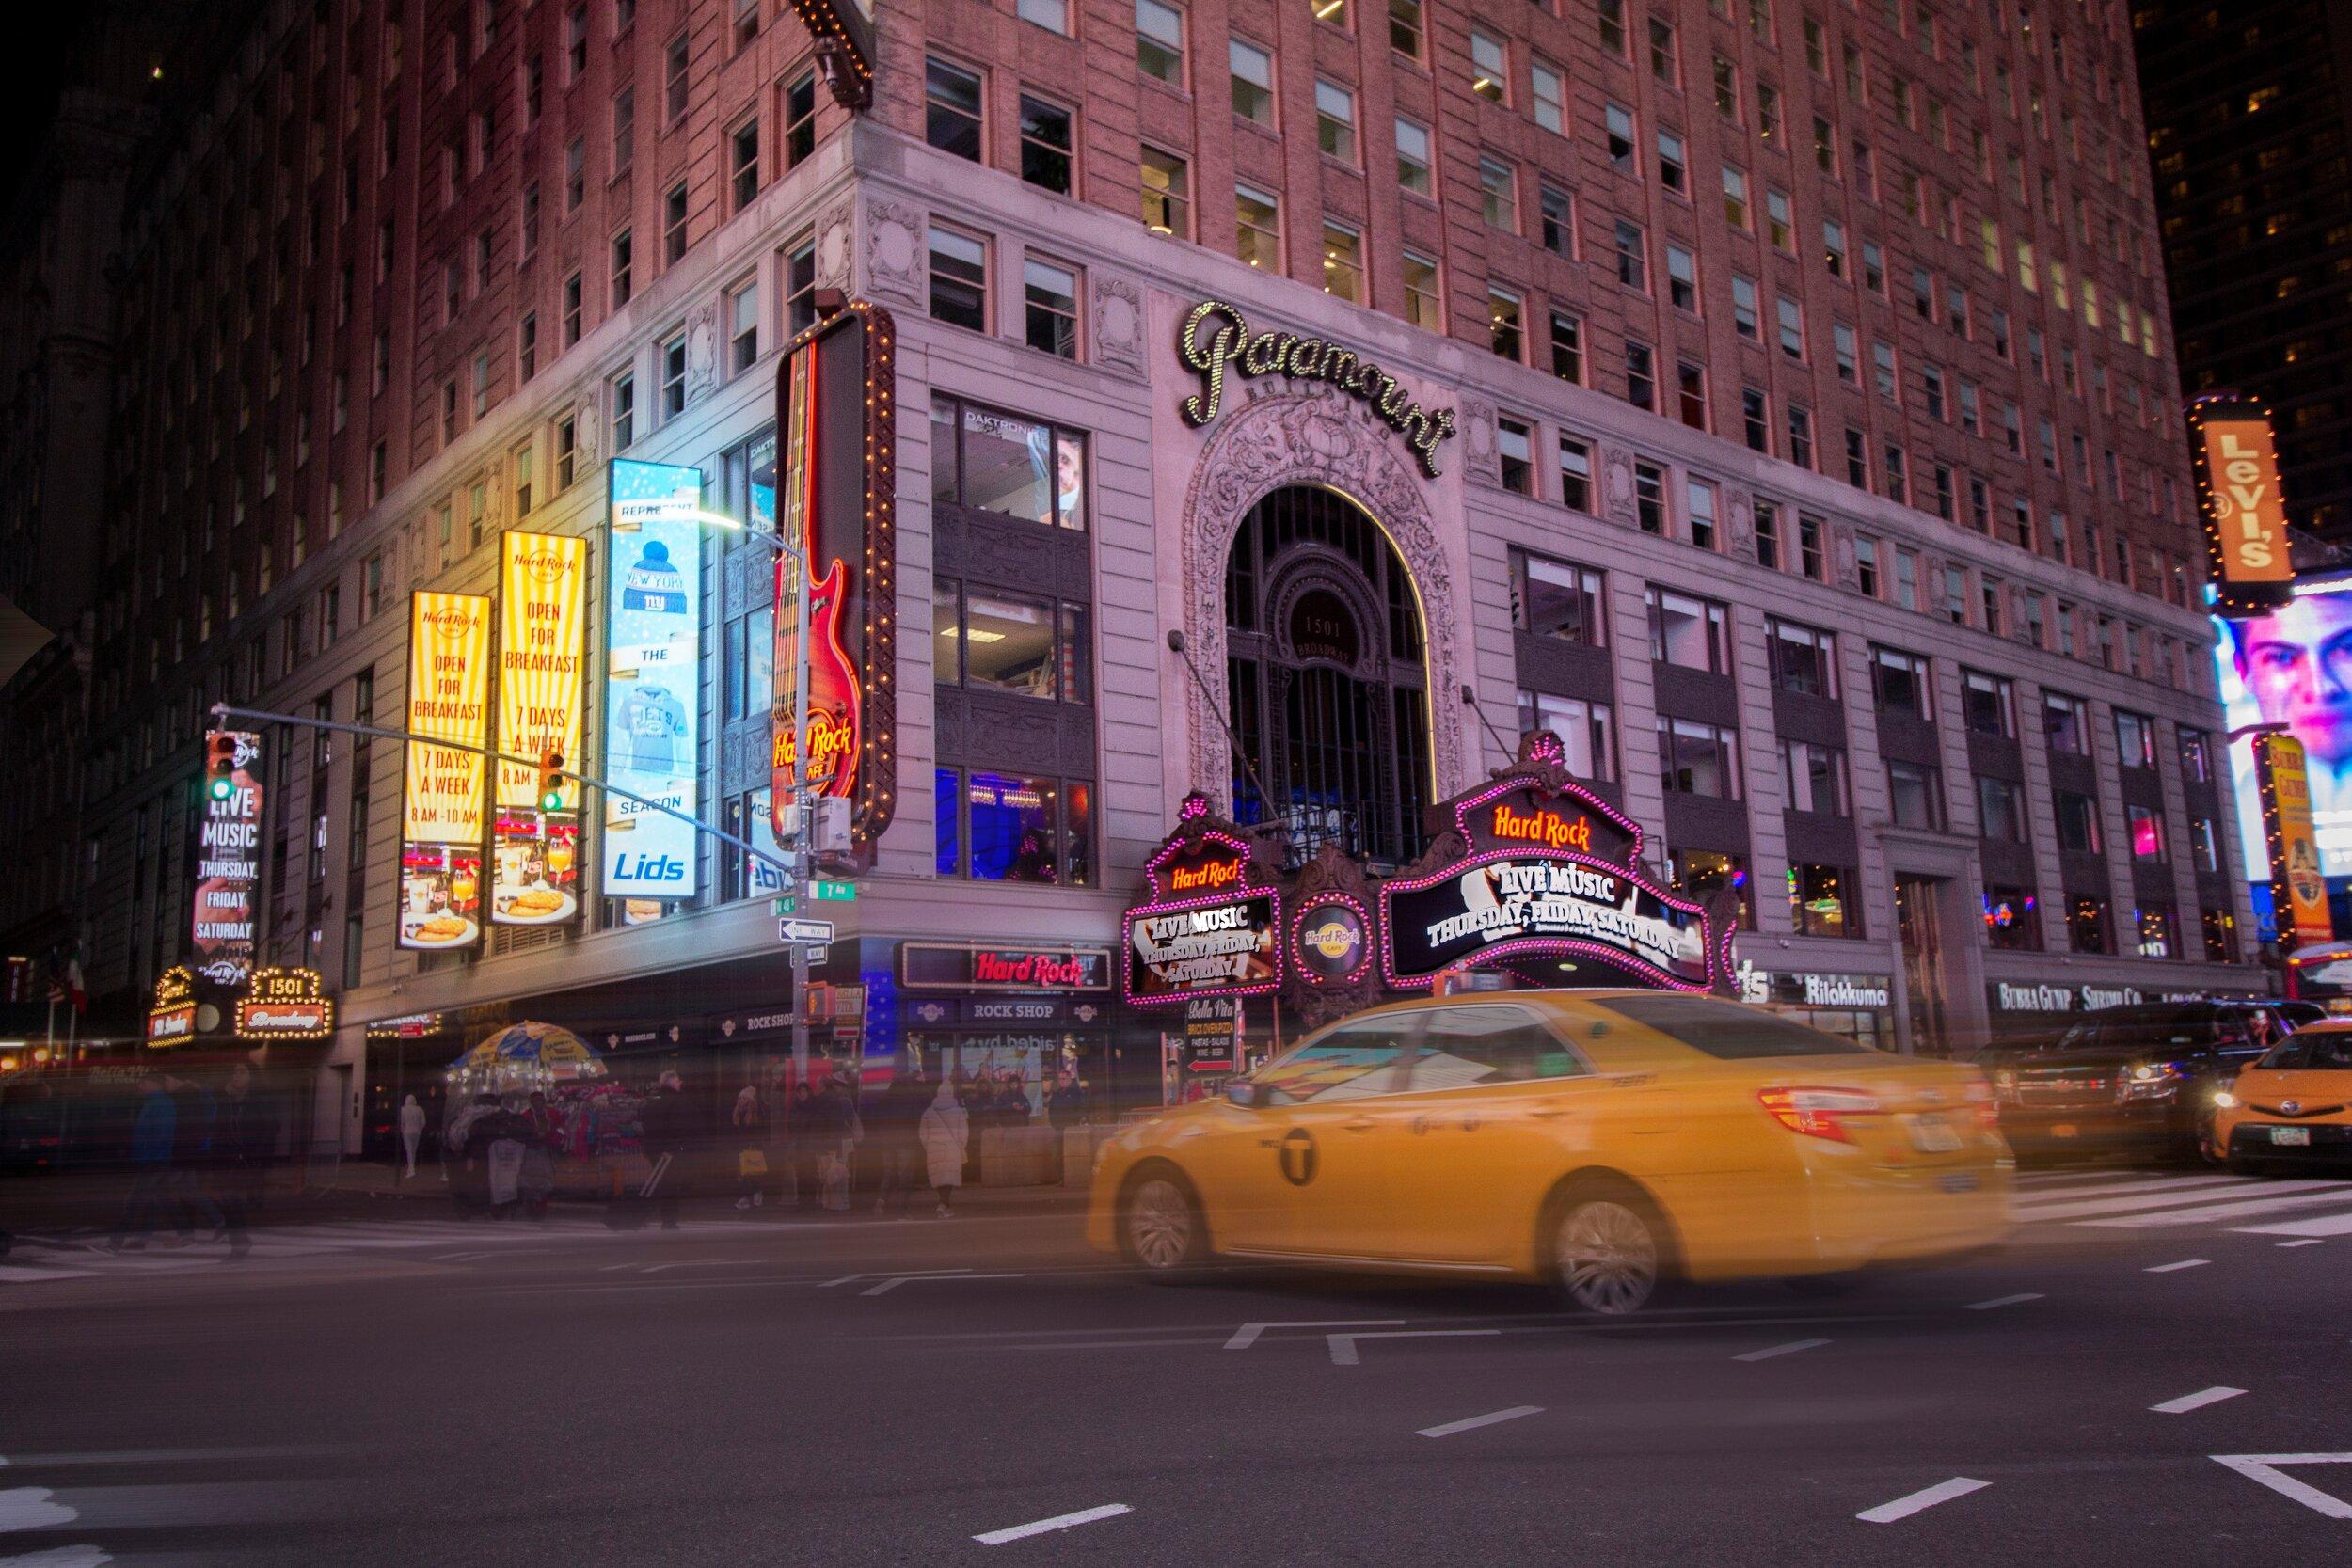 1501 Broadway Image 1.jpg